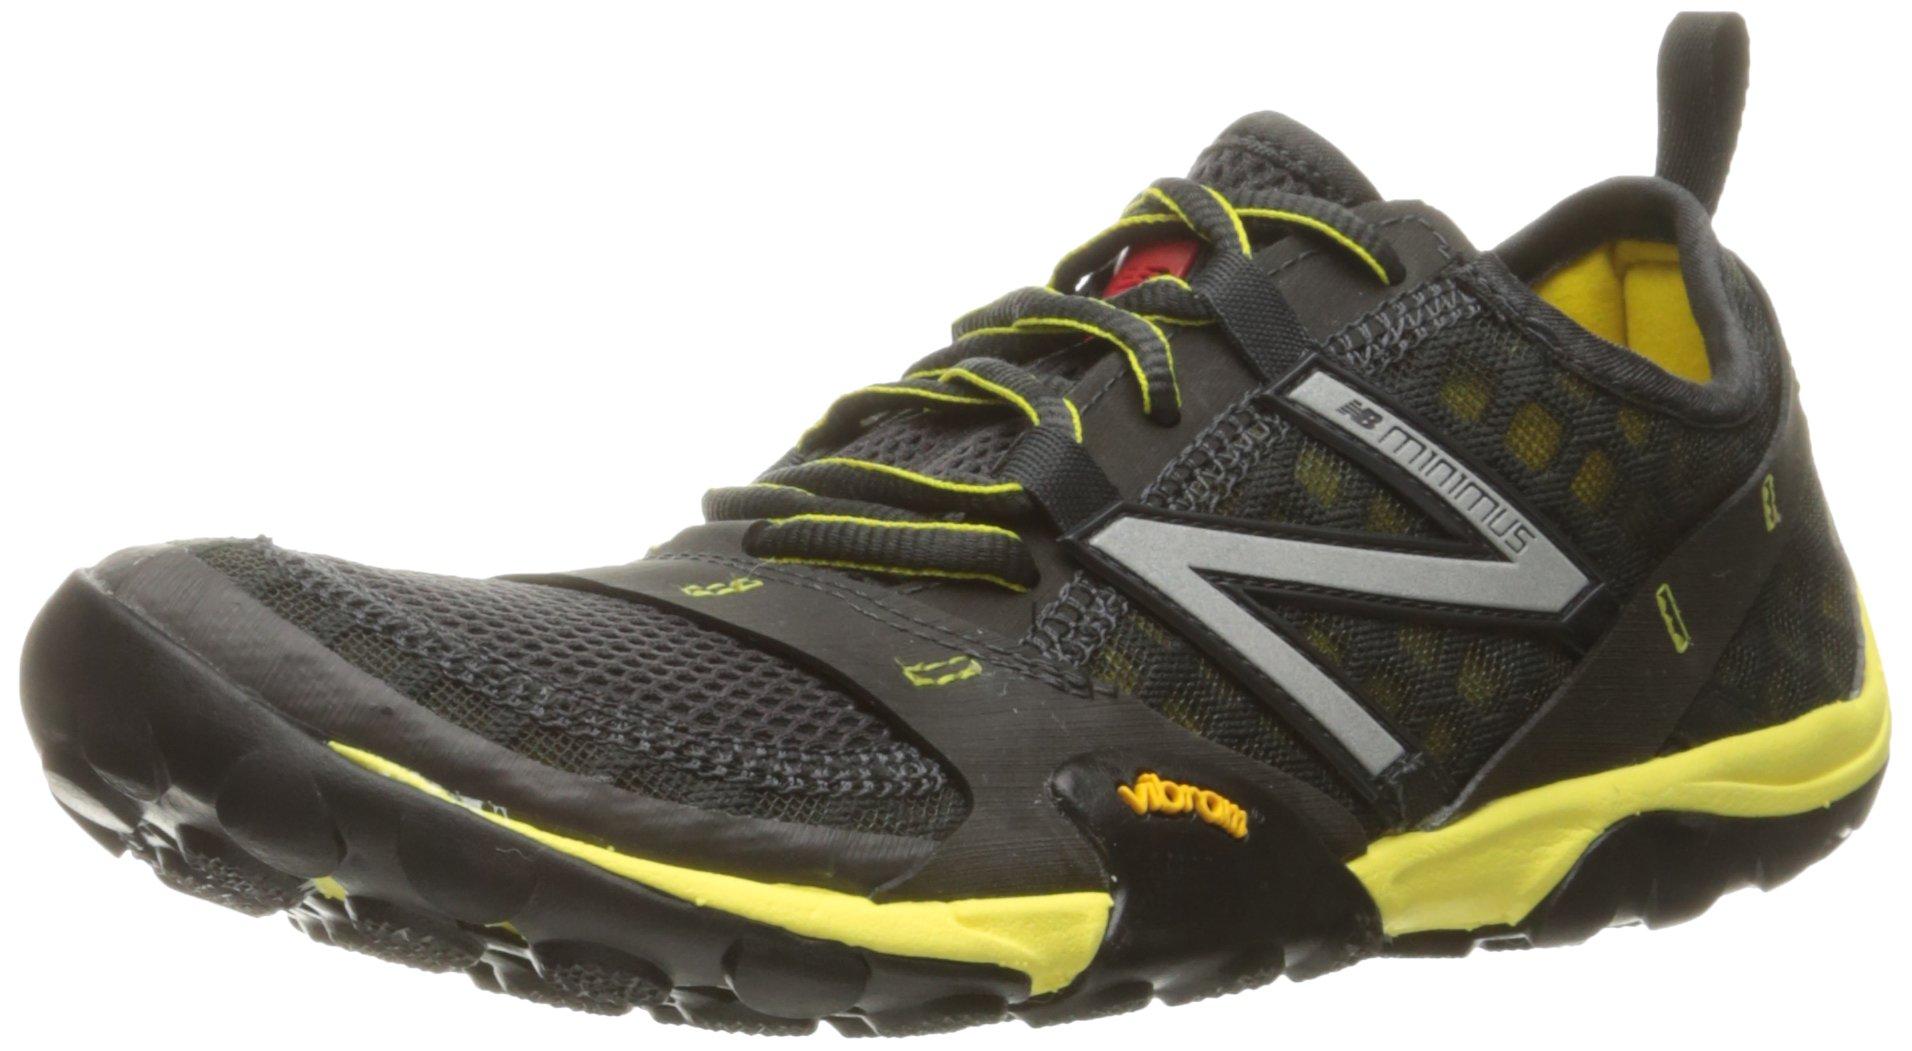 yellow45 New Minimus Trail HommeGrisgrey De Eu Balance 10Chaussures q5j4A3RL